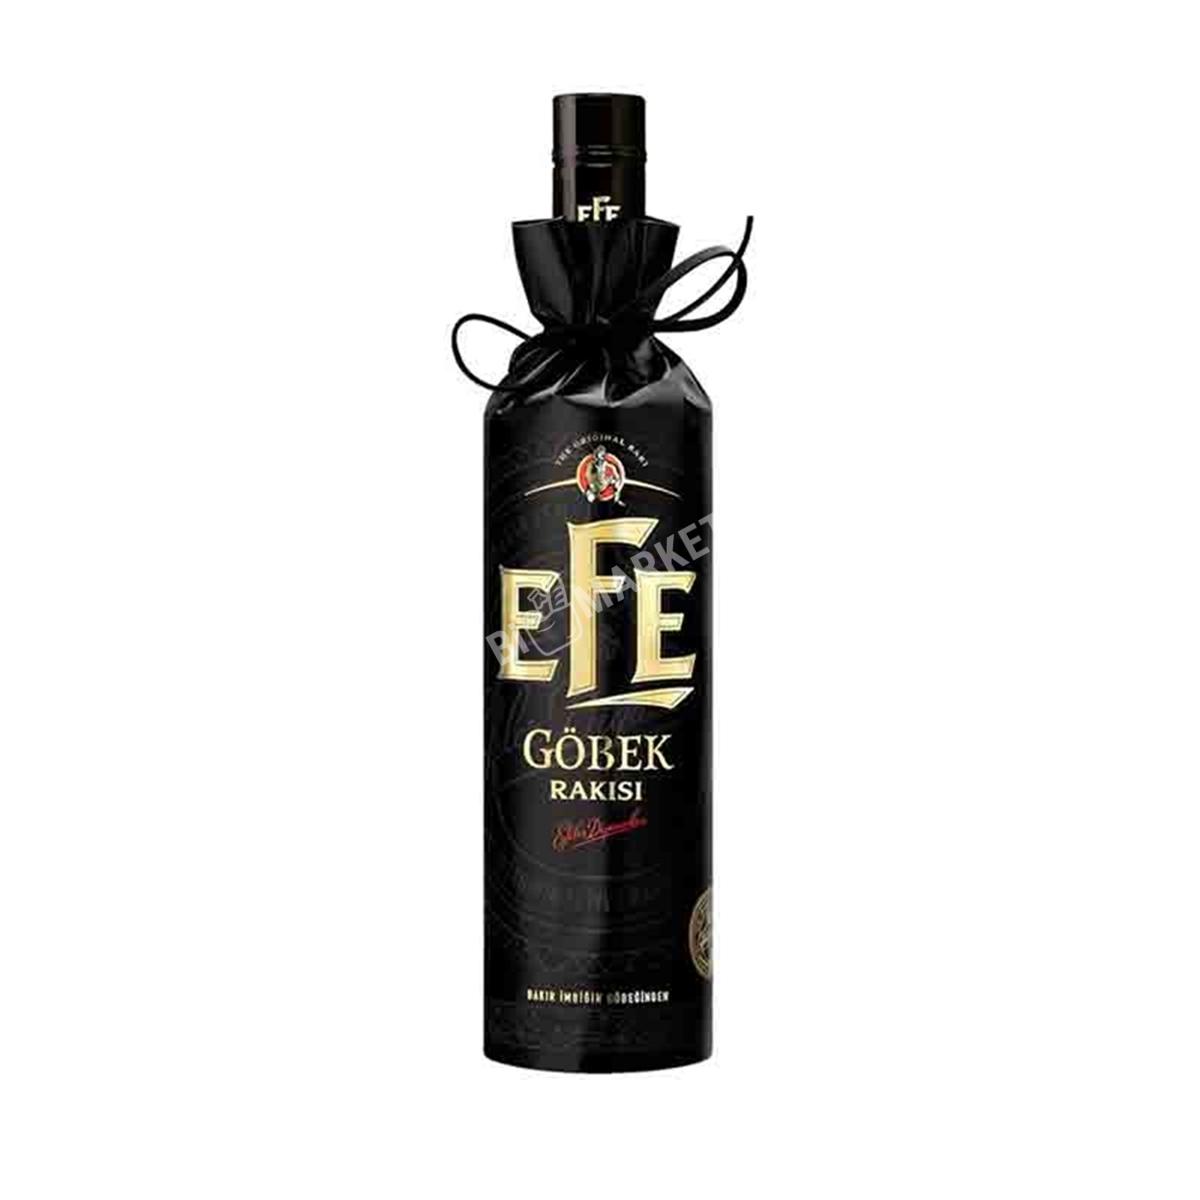 Efe Rakı is one of the best Turkish raki brands